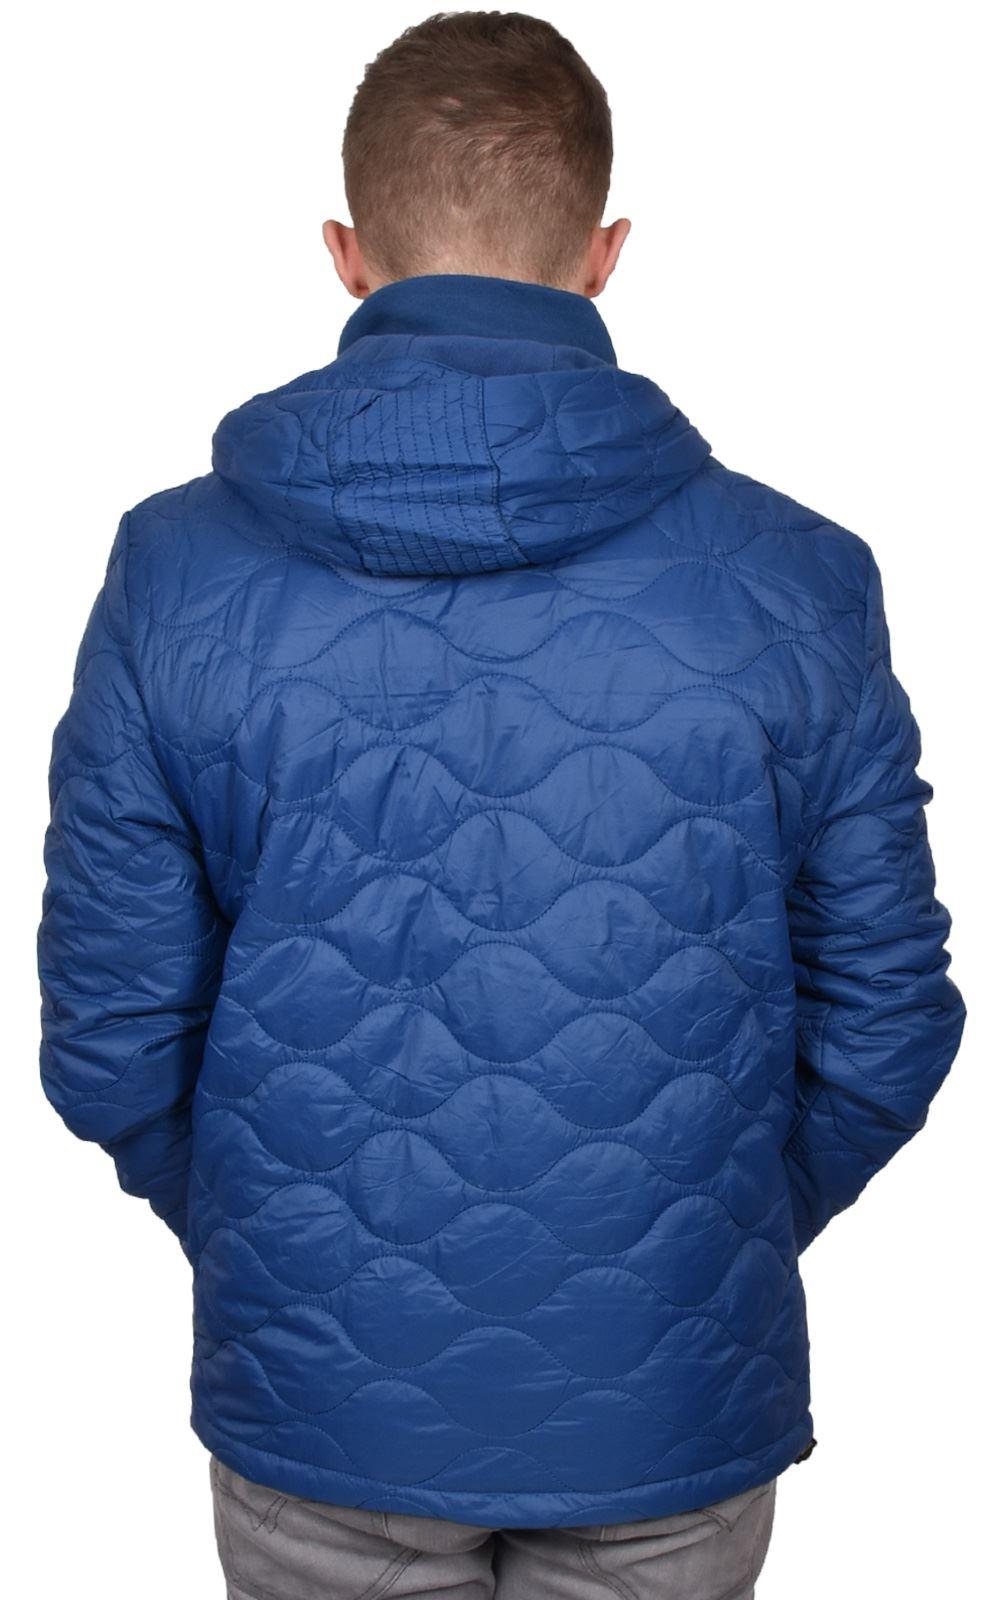 Mens-Smith-amp-Jones-Jacket-Full-Zip-Fleece-Lined-Hooded-Light-Weight-Warm-Coat thumbnail 12